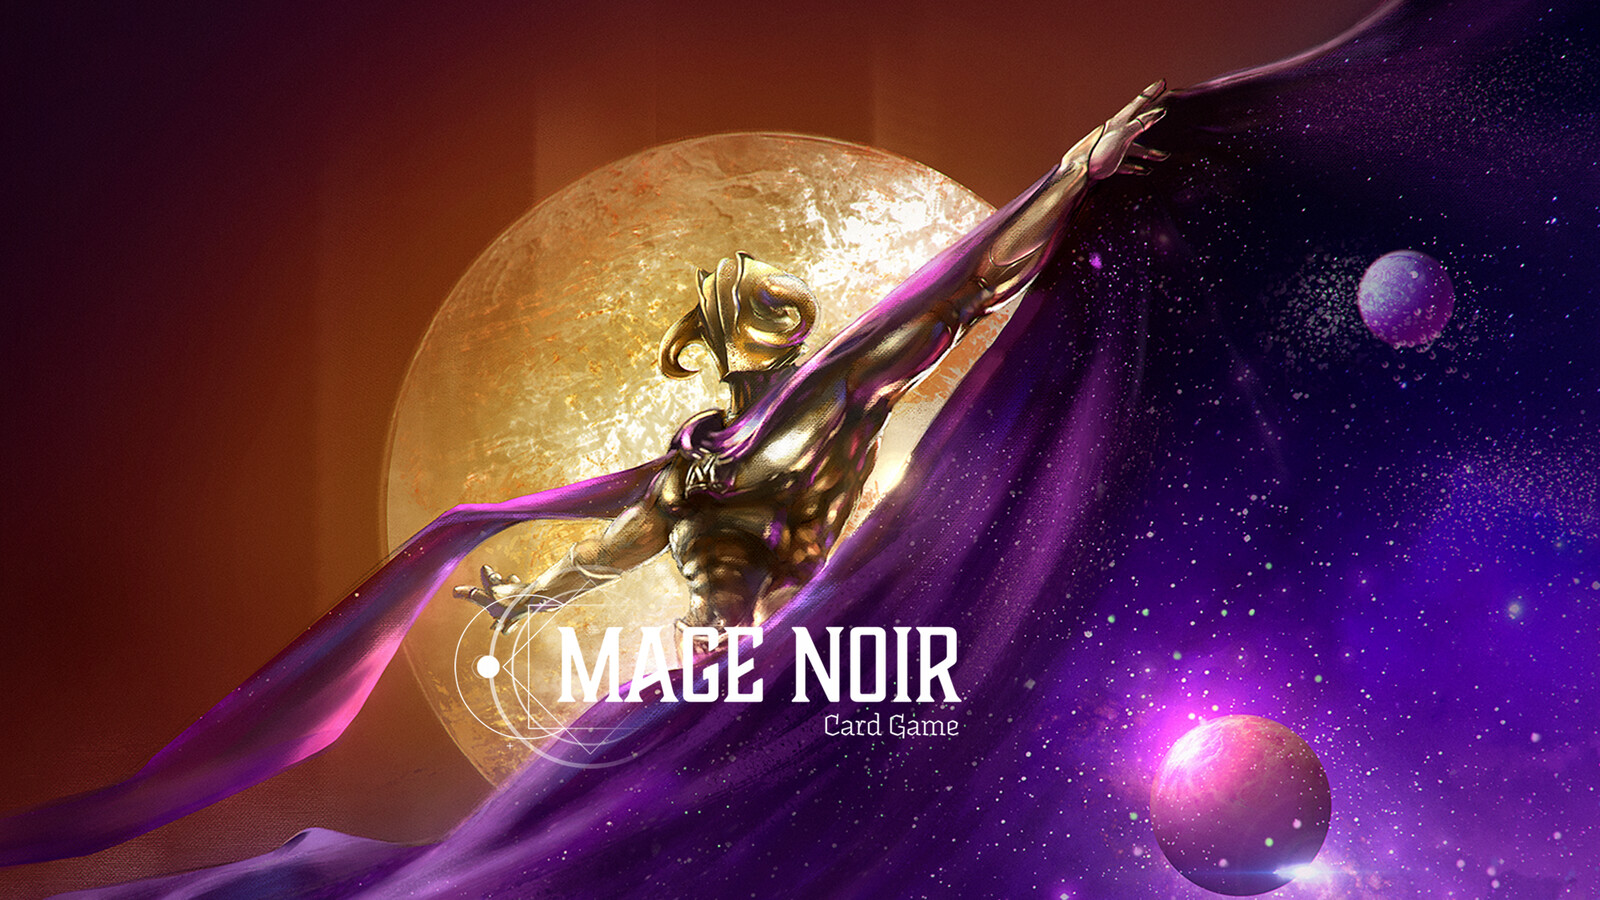 Galactic Mantle - MAGE NOIR